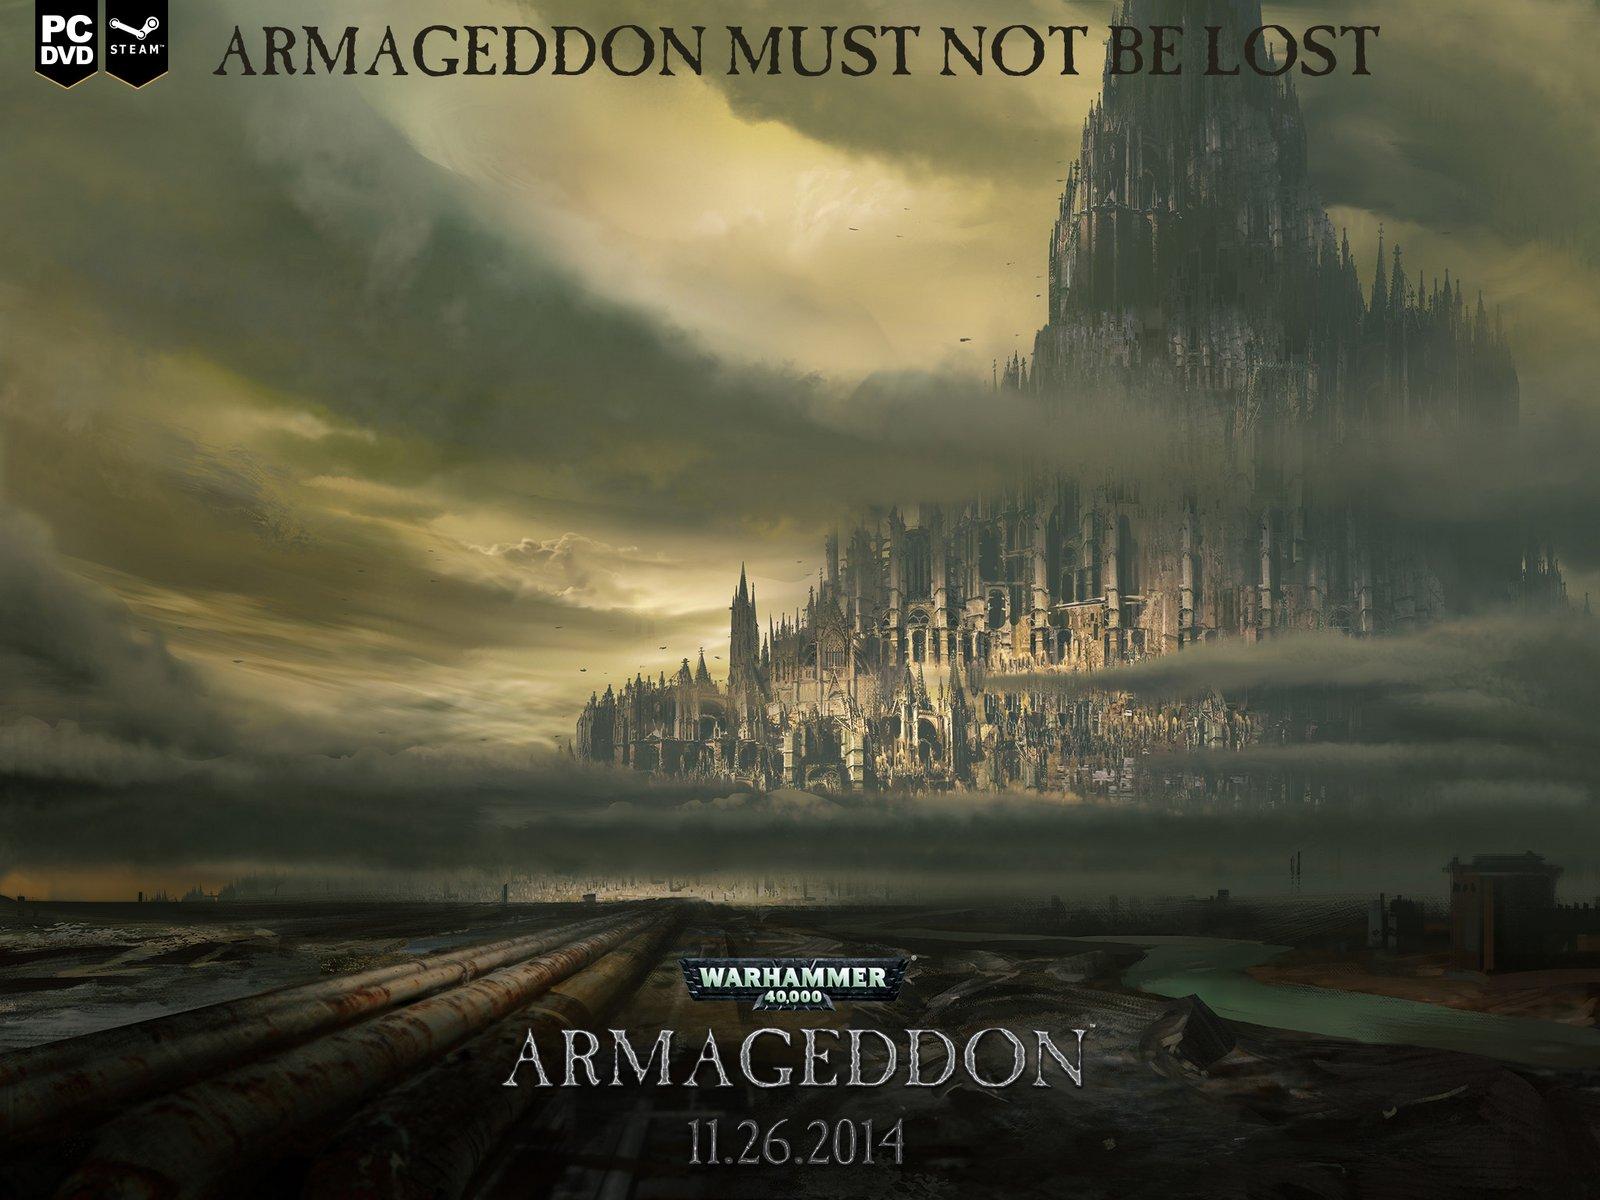 [W40K] Collection d'images : Villes et Ruches dans Wharmmer 40.000 - Page 2 Warhammer-40000-armageddon-hive